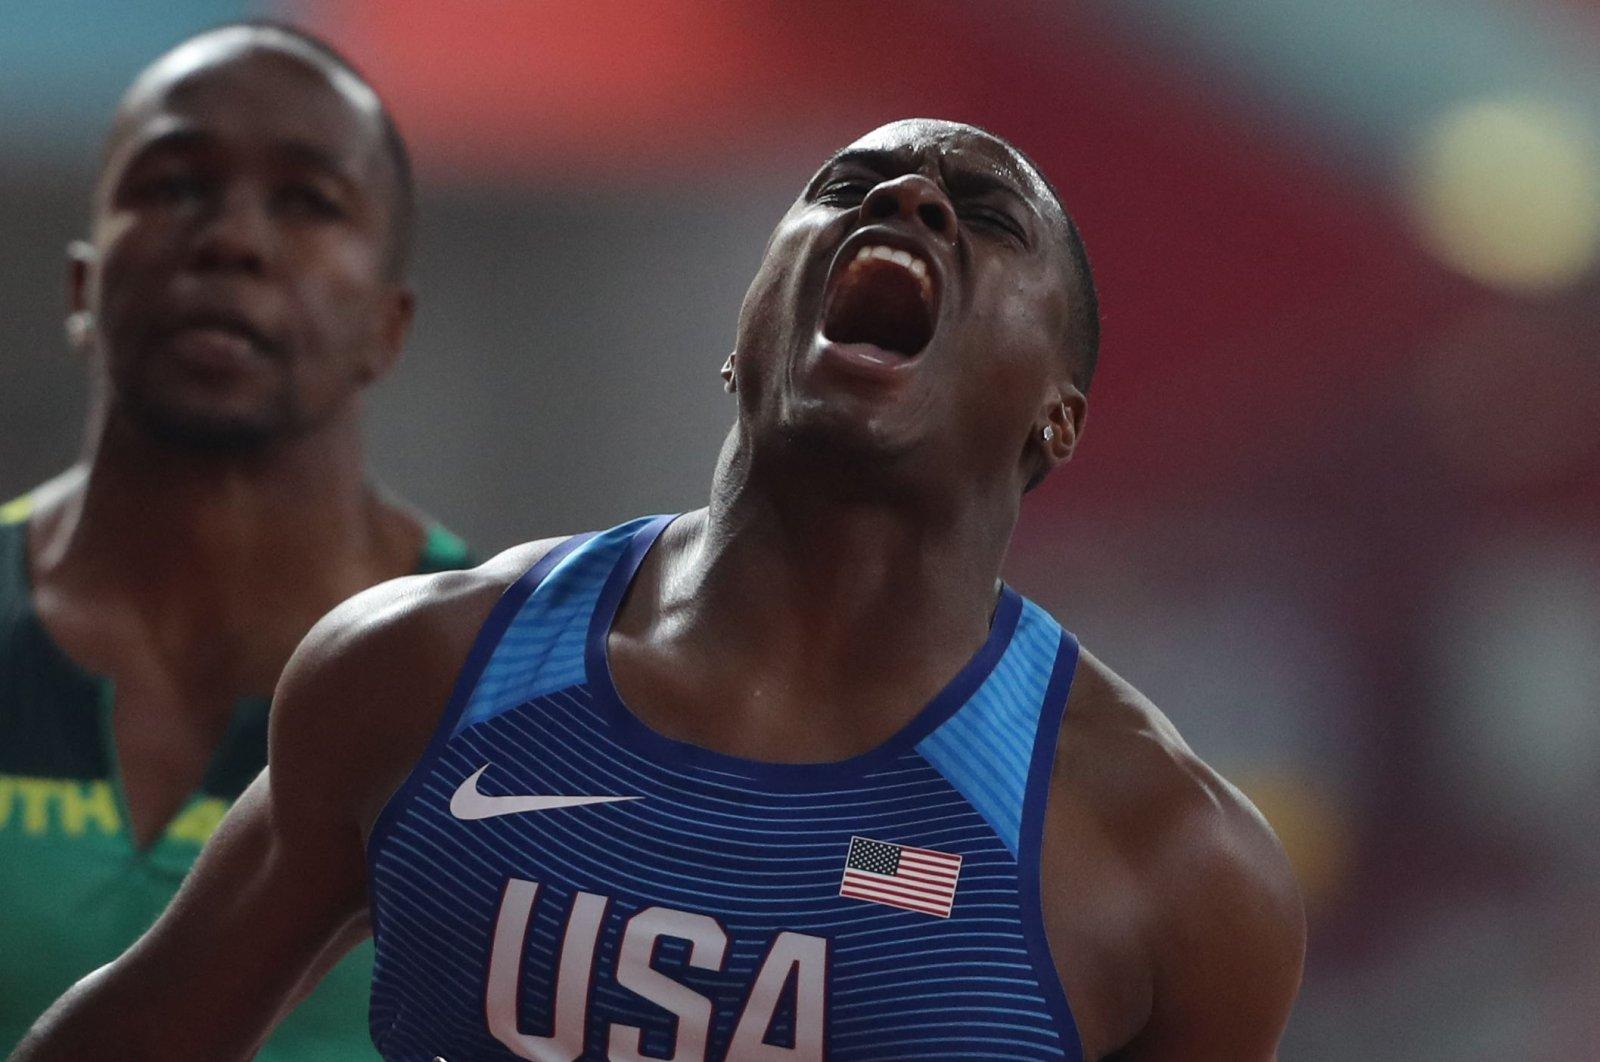 USA's Christian Coleman reacts as he wins the Men's 100-meter final at the 2019 IAAF World Athletics Championships at the Khalifa International Stadium, Doha, Qatar,Sept. 28, 2019. (AFP Photo)